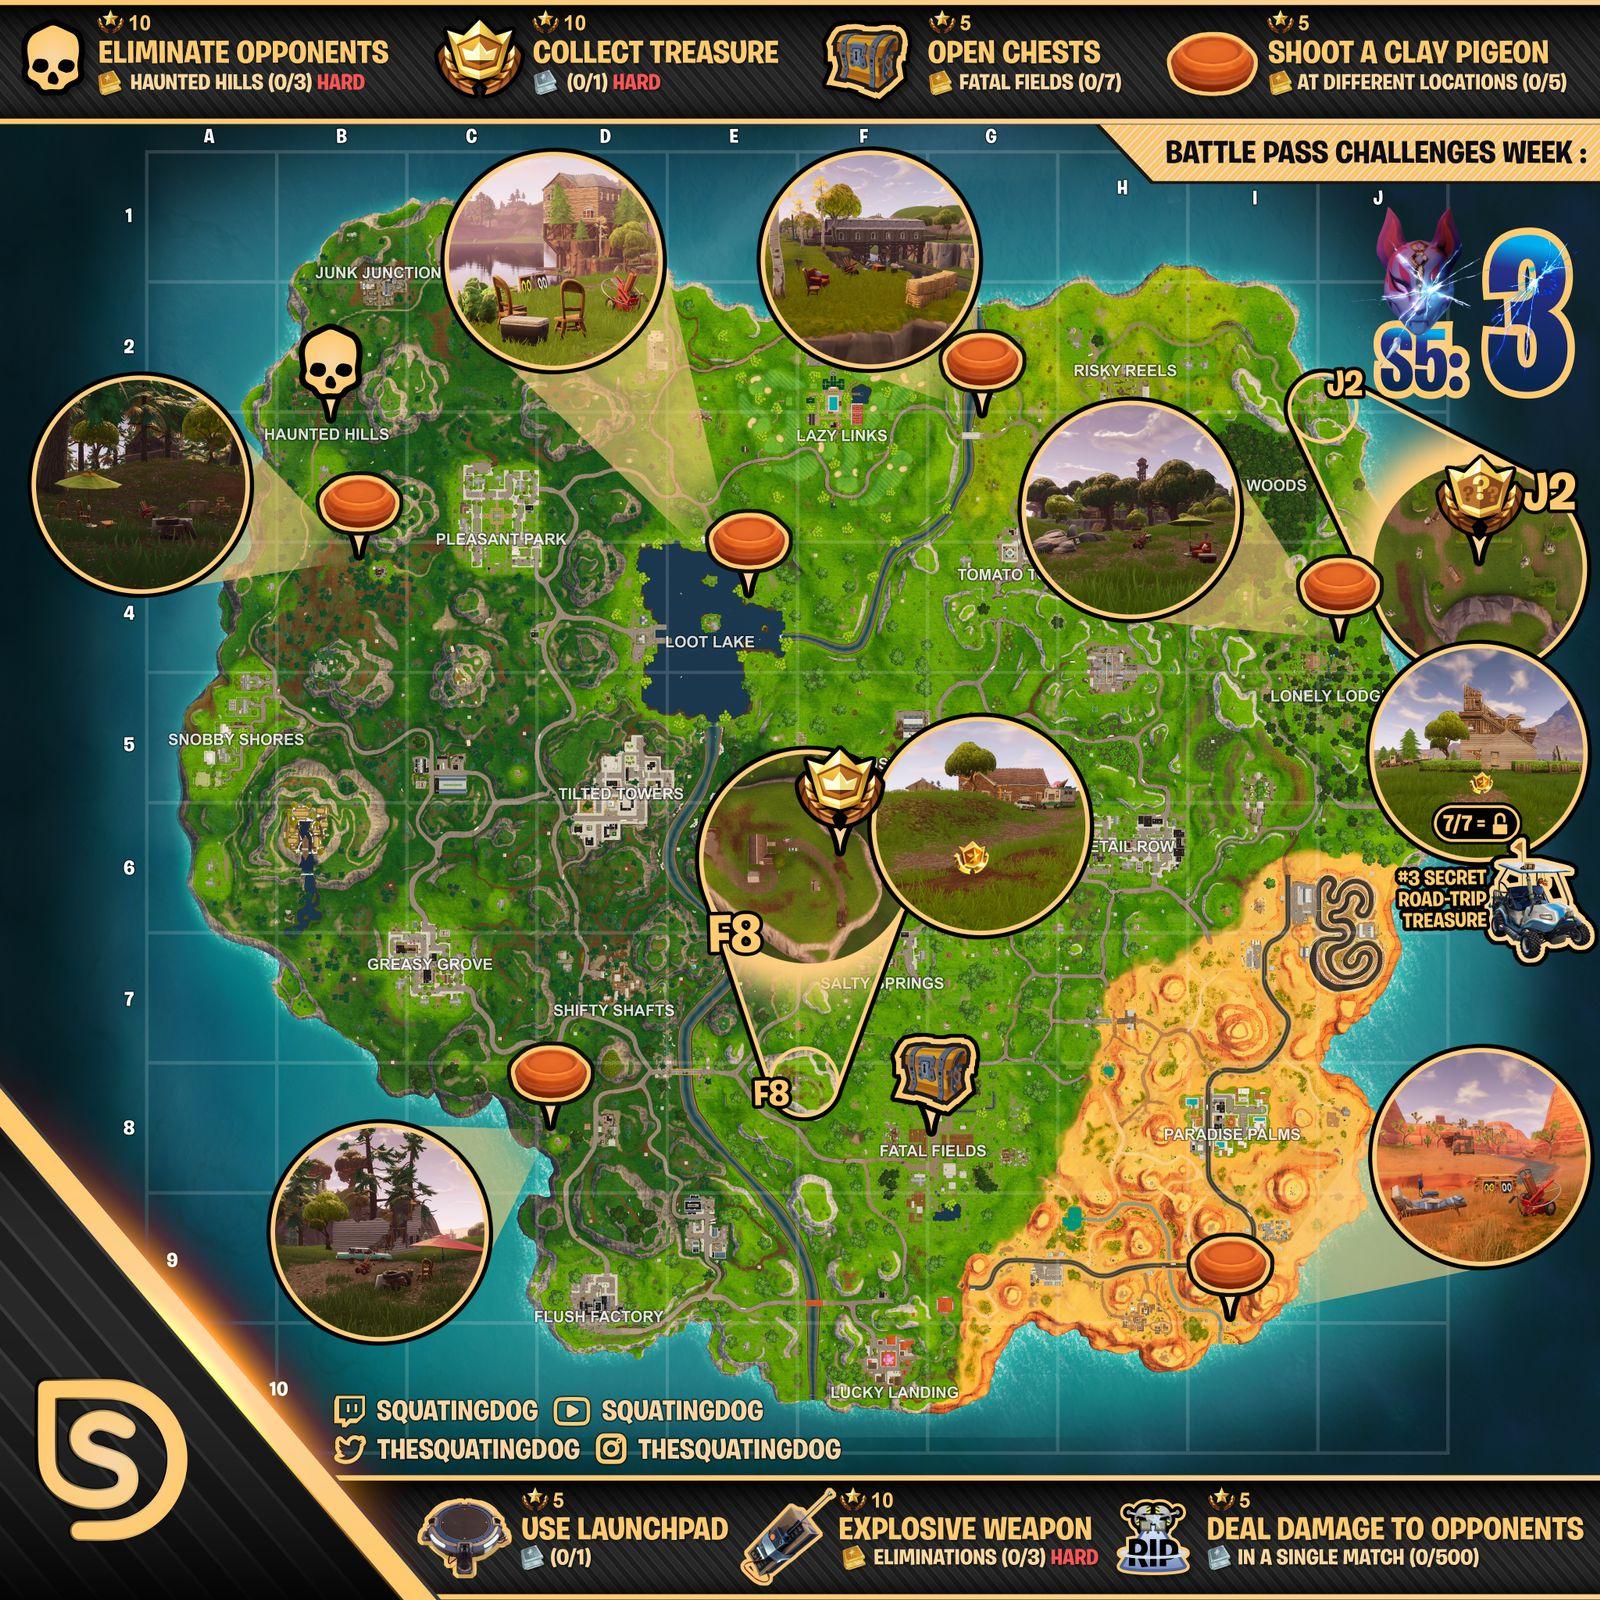 [Image: Cheat-Sheet-map-for-Fortnite-Season-5-Week-3.jpg]